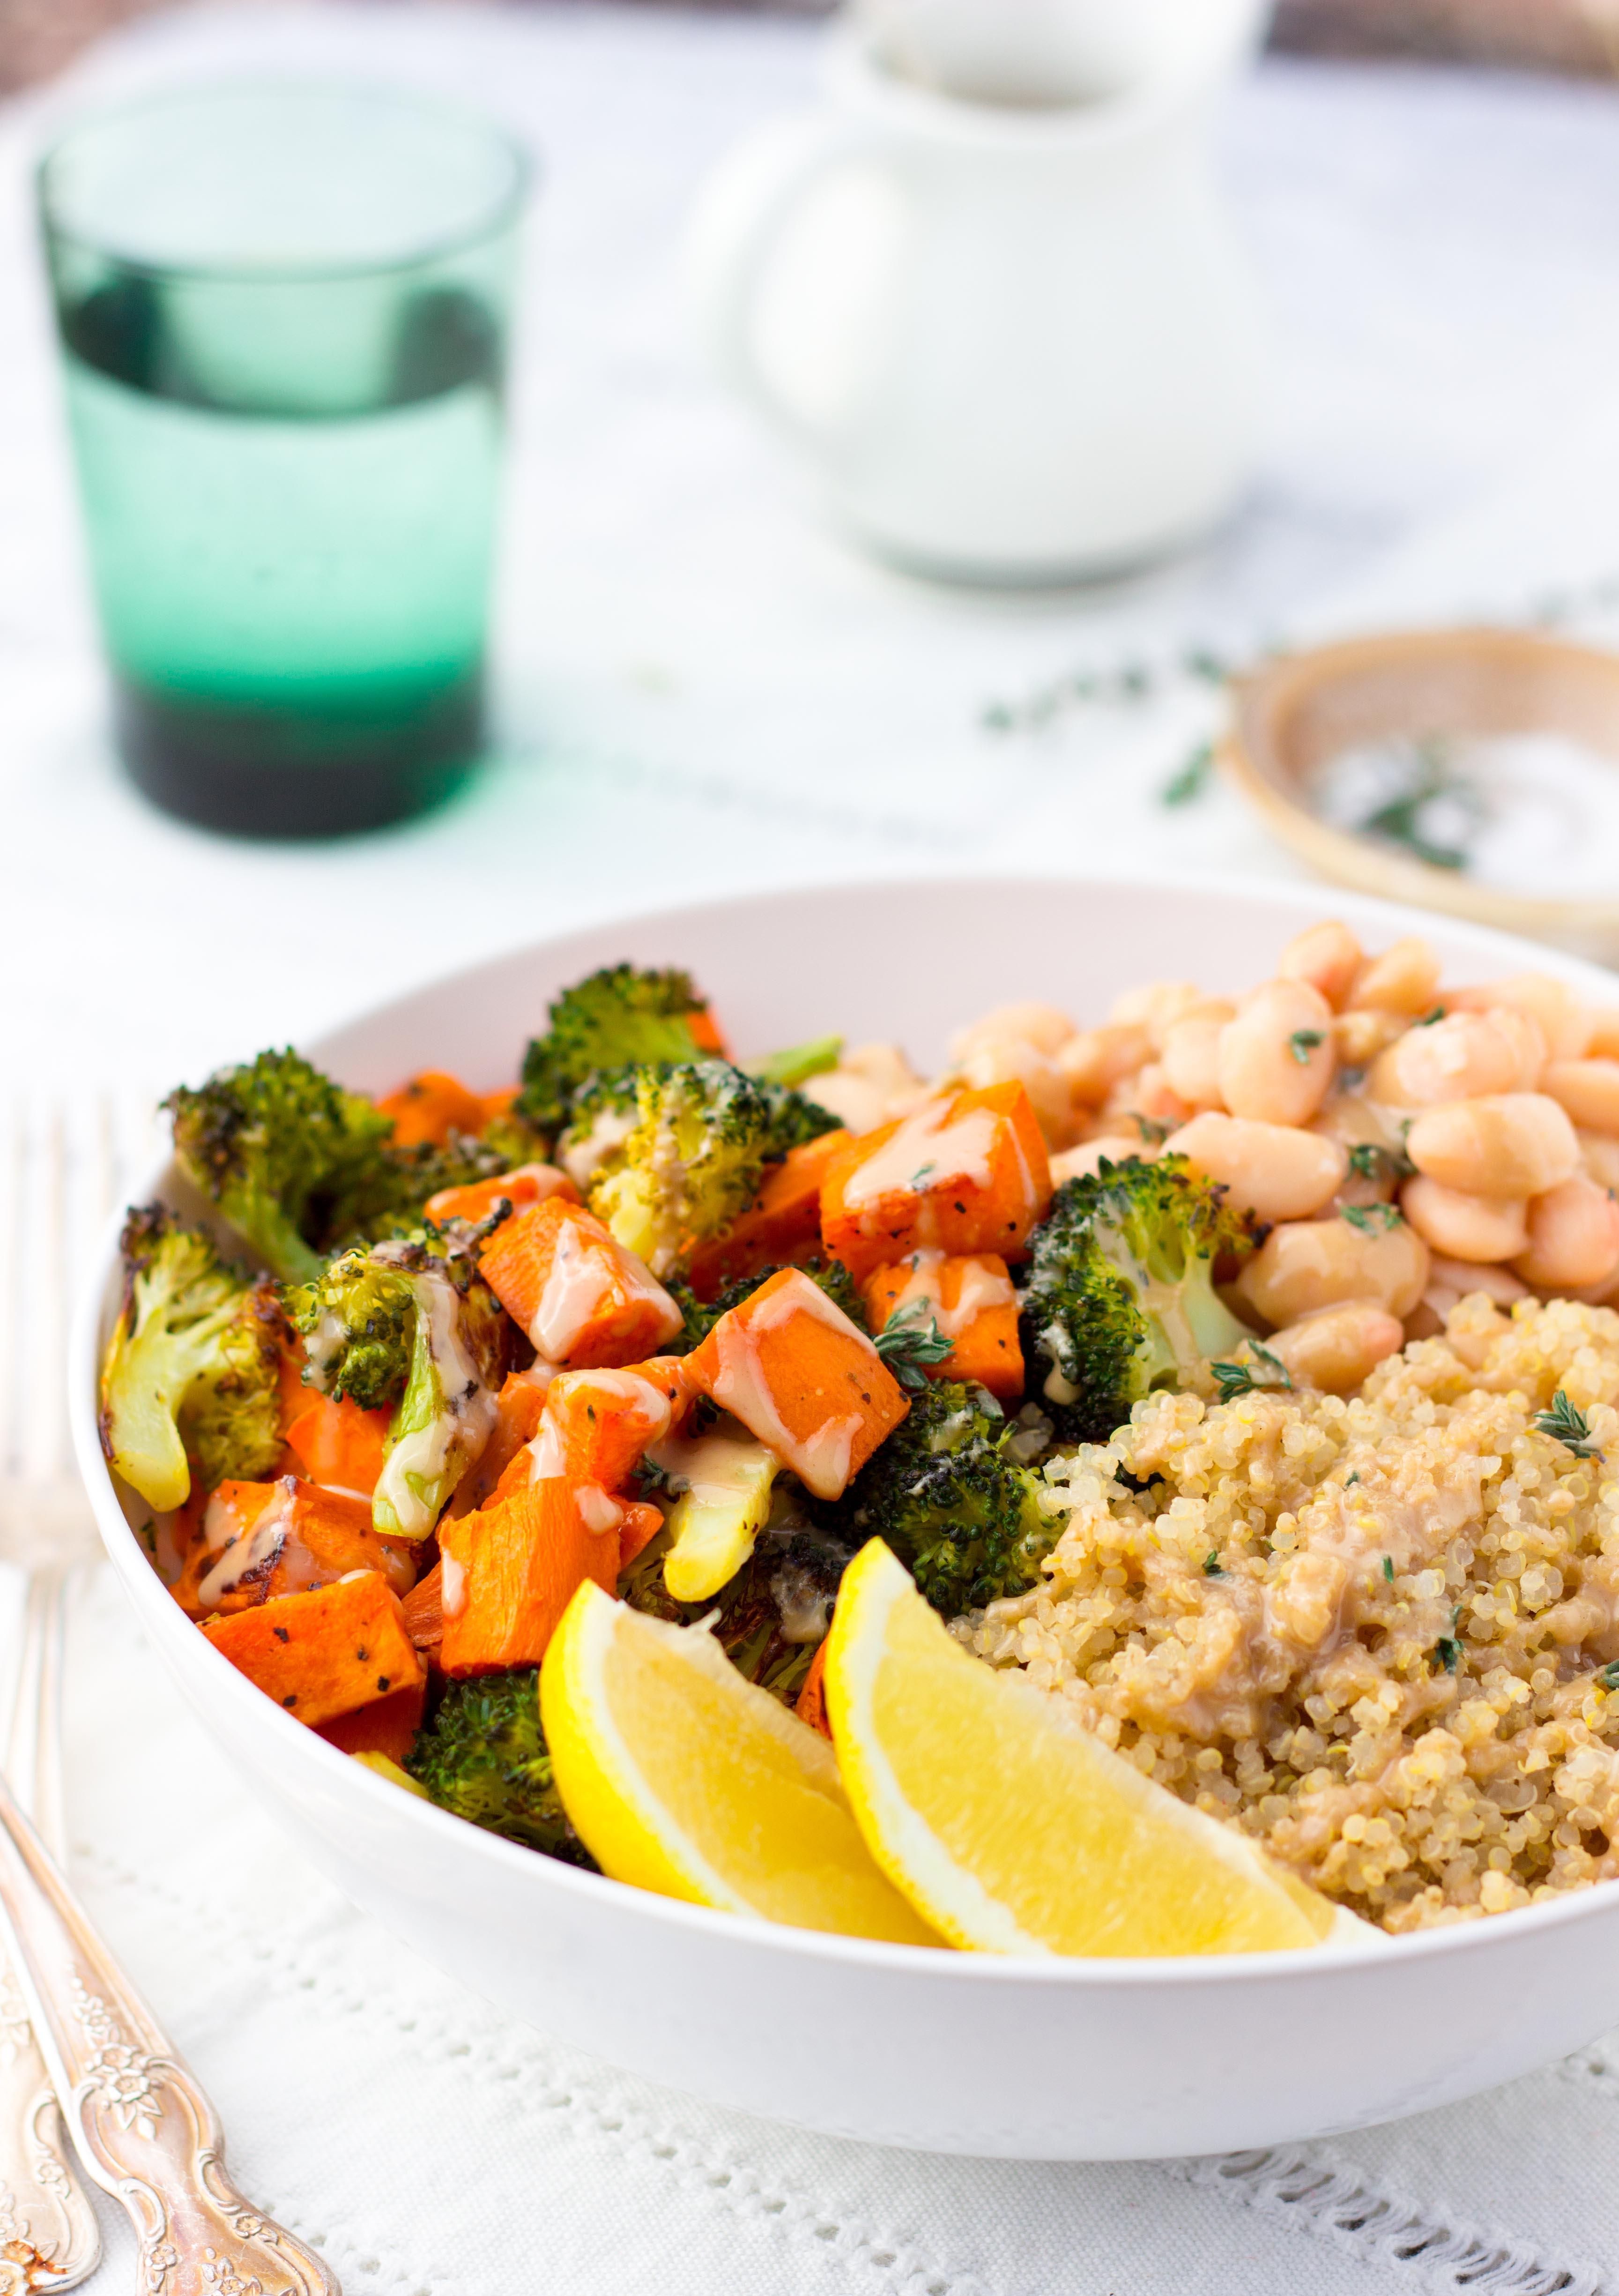 Roasted Sweet Potato Broccoli Winter Bowls She Likes Food